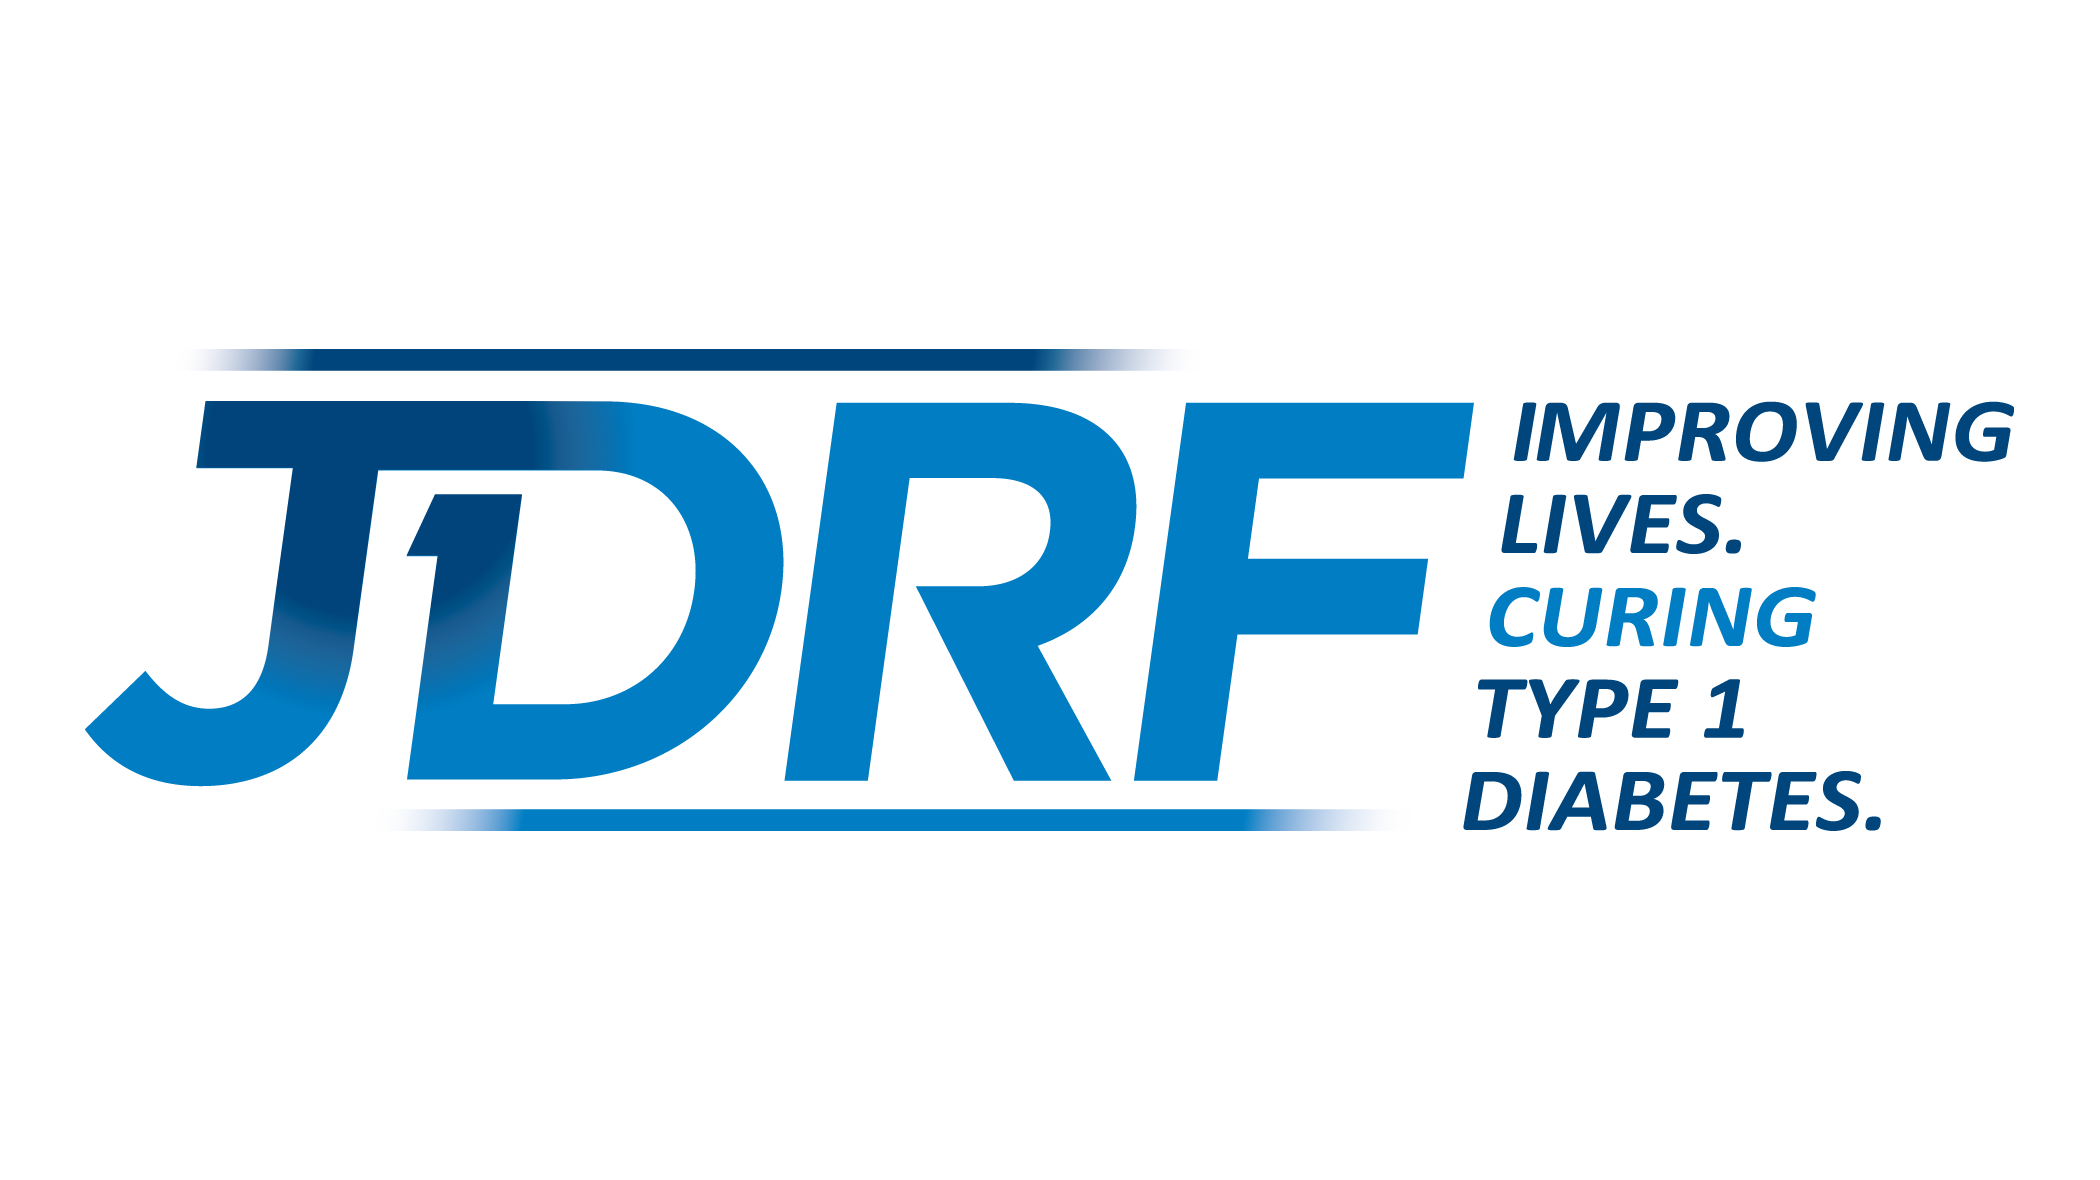 Jdrf-logo-link-box